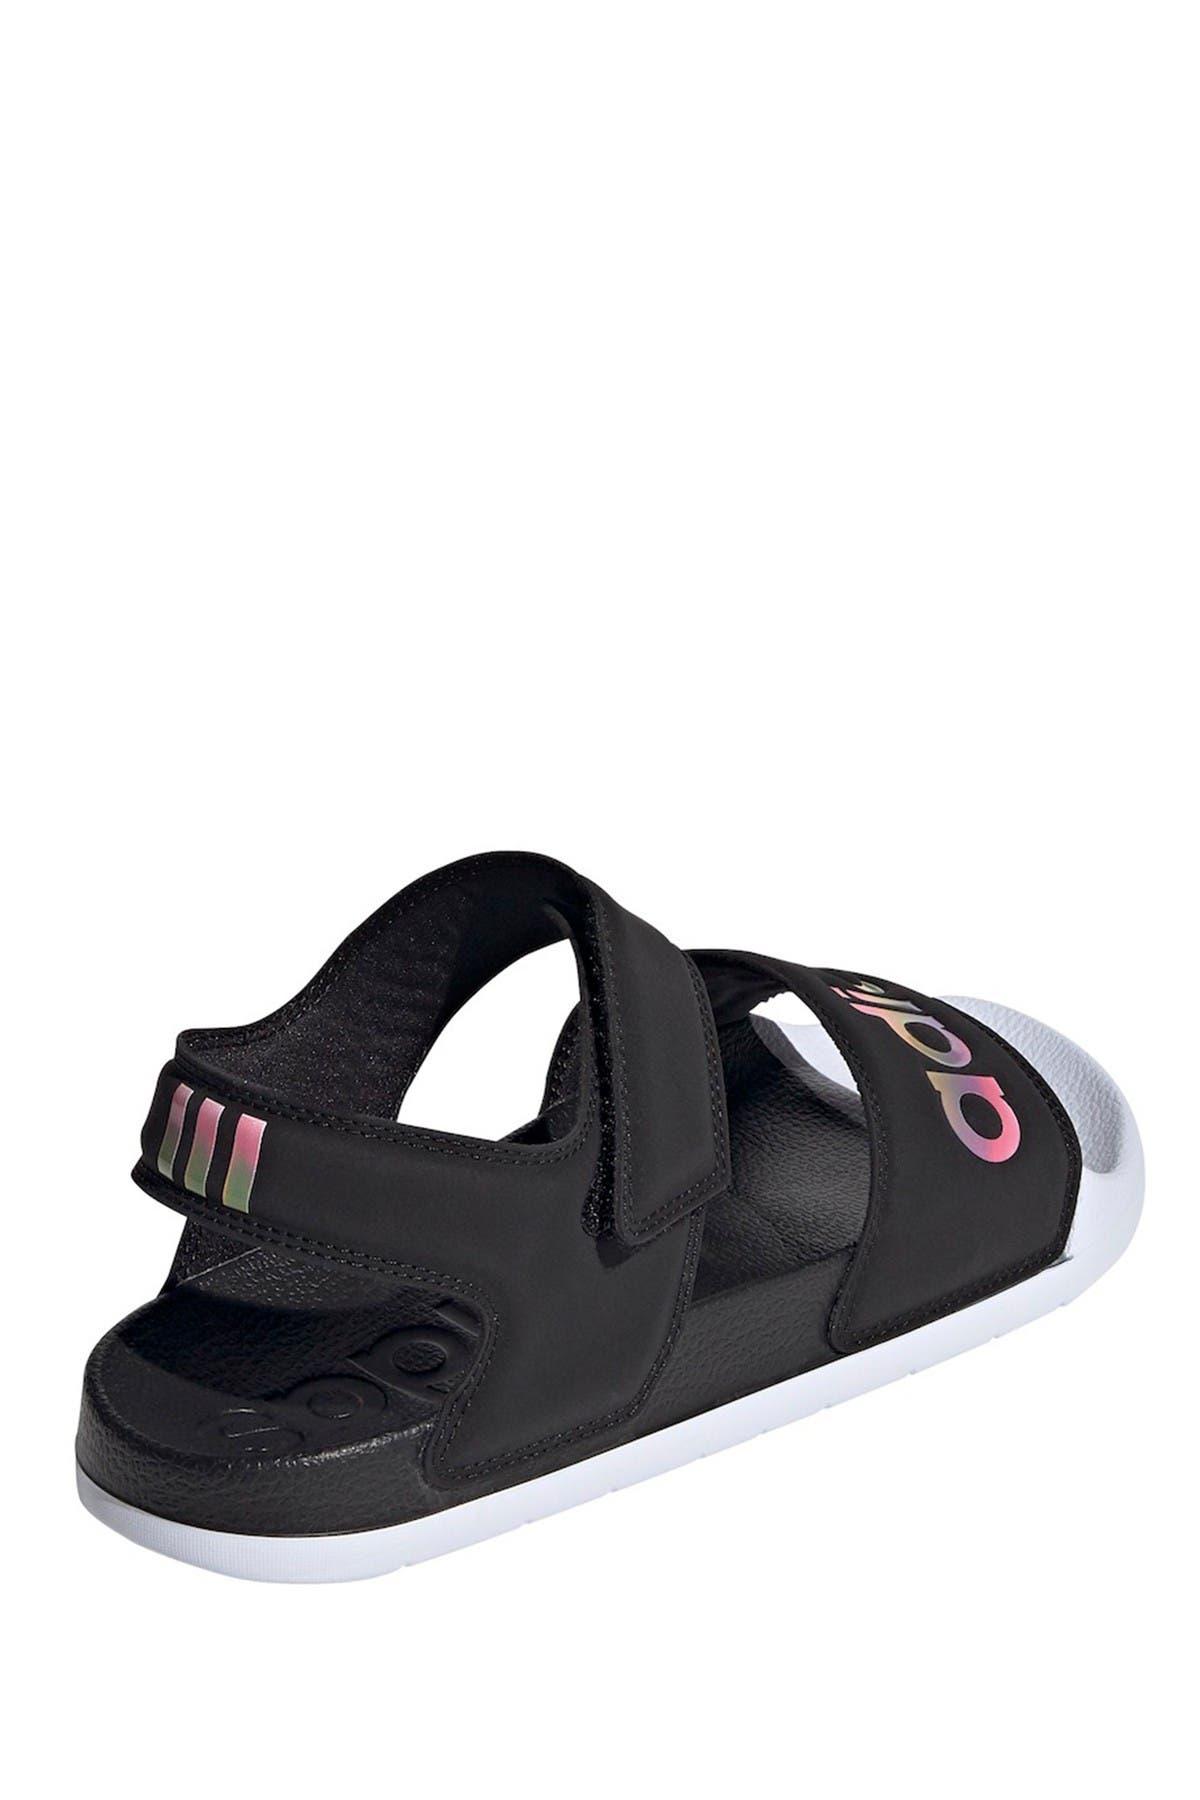 Image of adidas Adilette Flip Flop